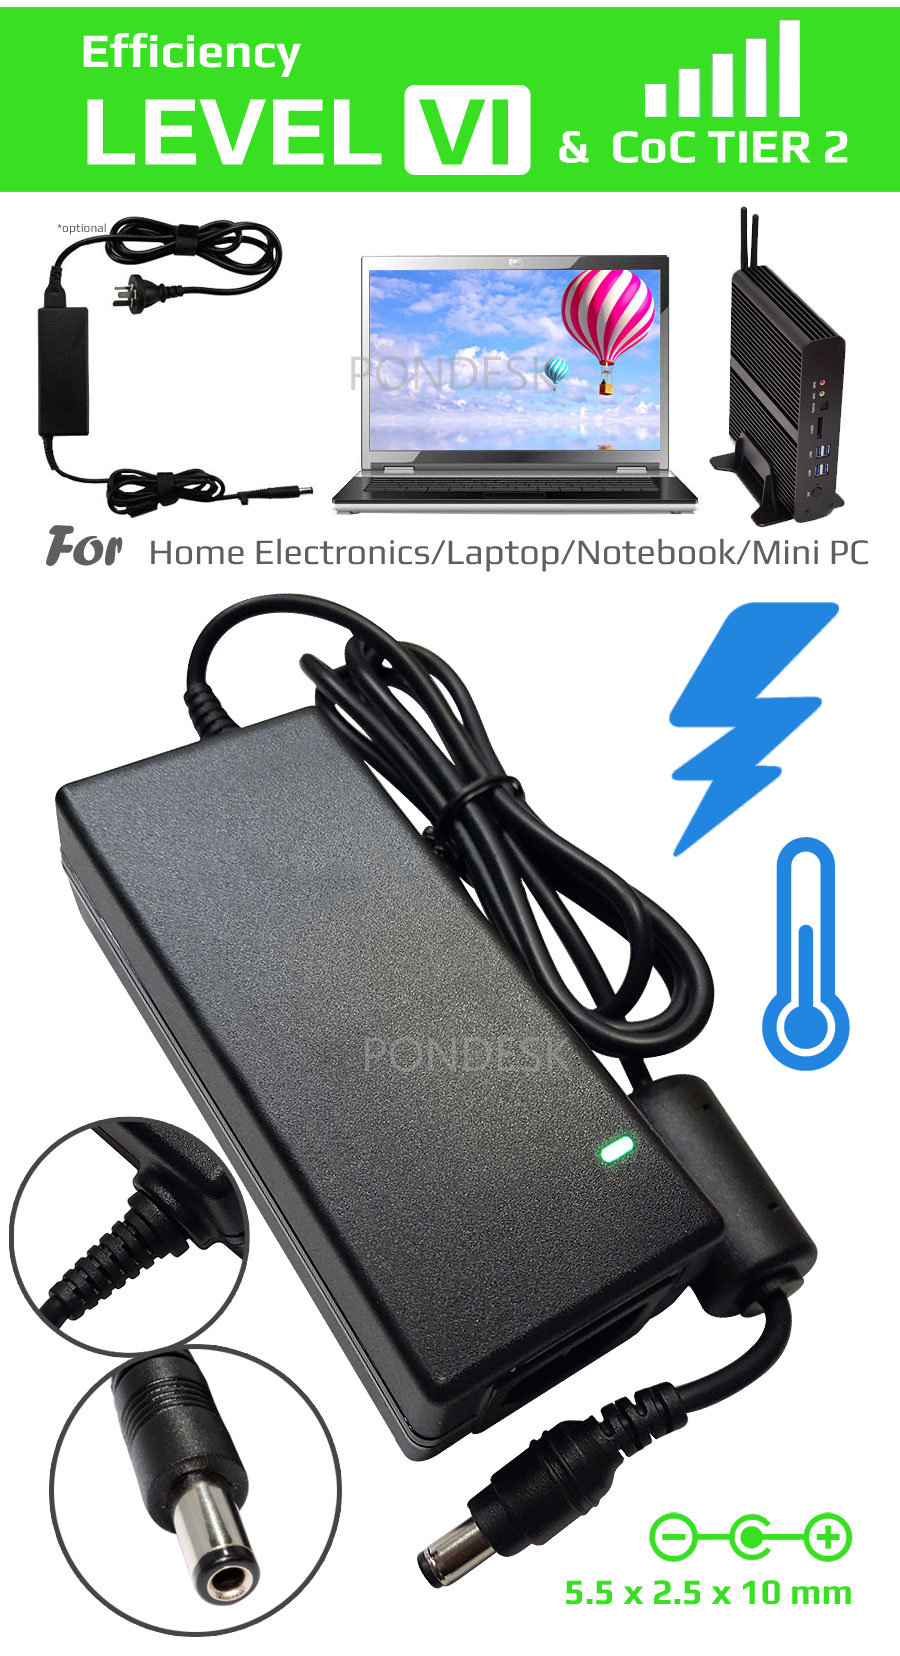 DOE Level VI 12V 5A 60W Switching Desktop AC Power Adapter - PSEL-006   Image